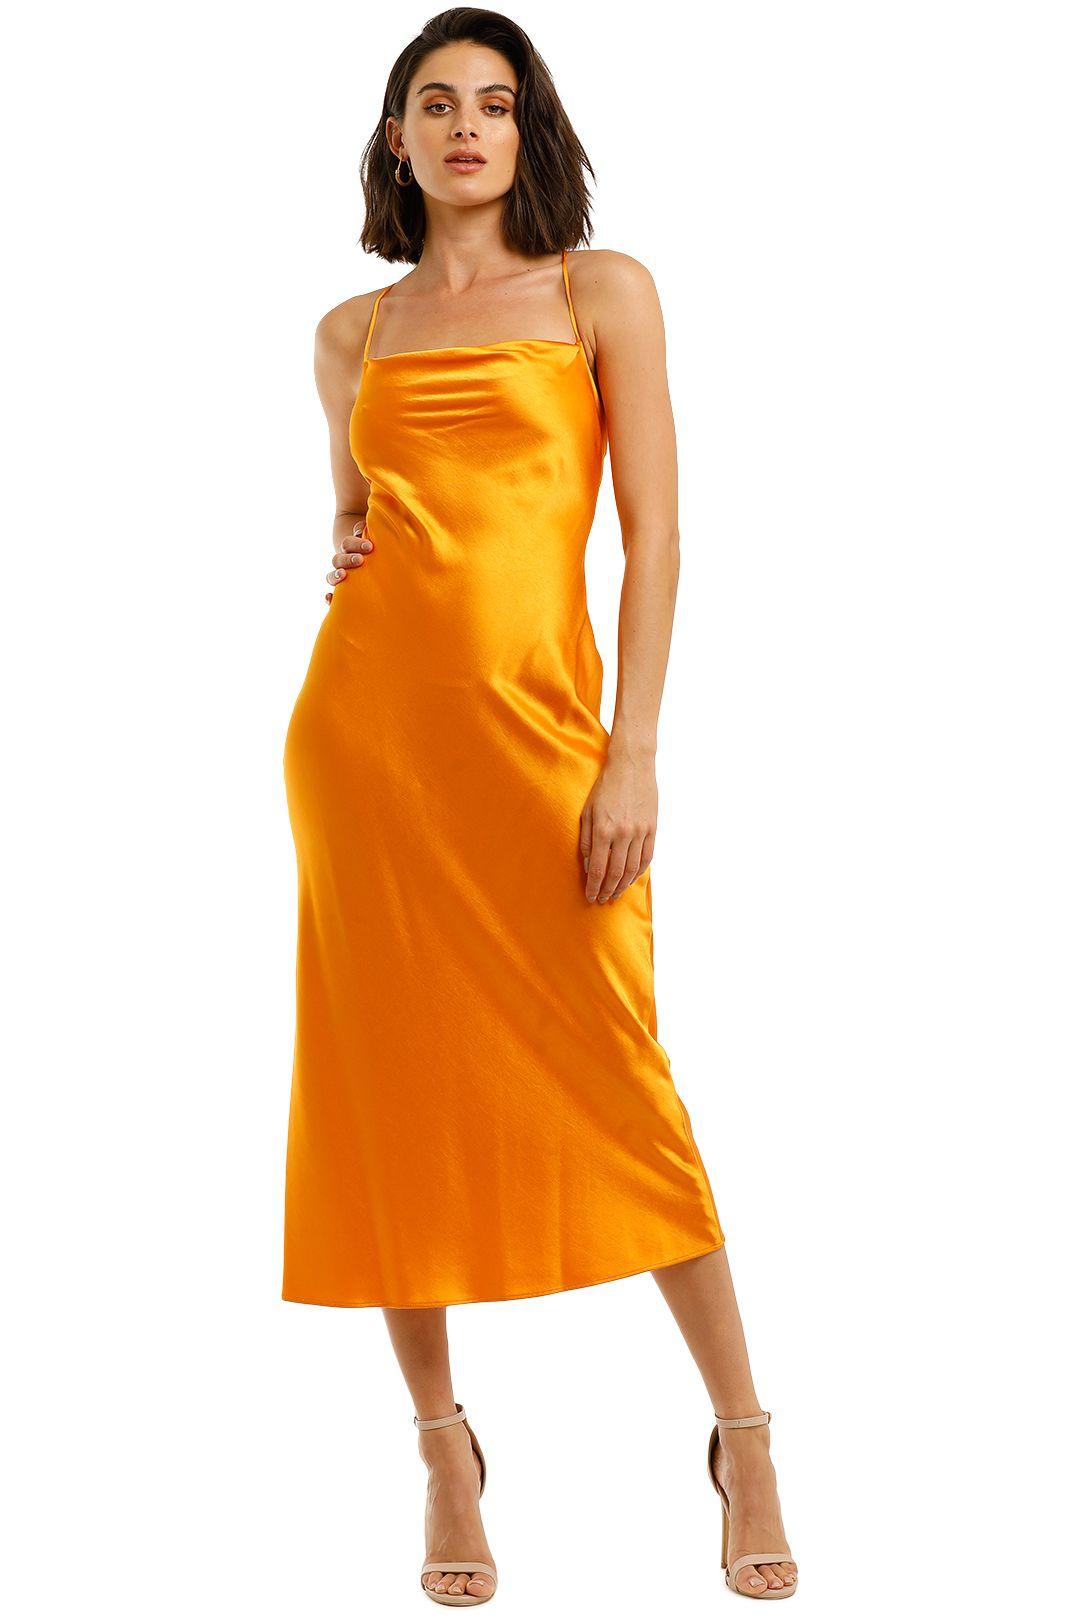 Bec-and-Bridge-Seraphine-Lace-Up-Midi-Dress-Tangerine-Front